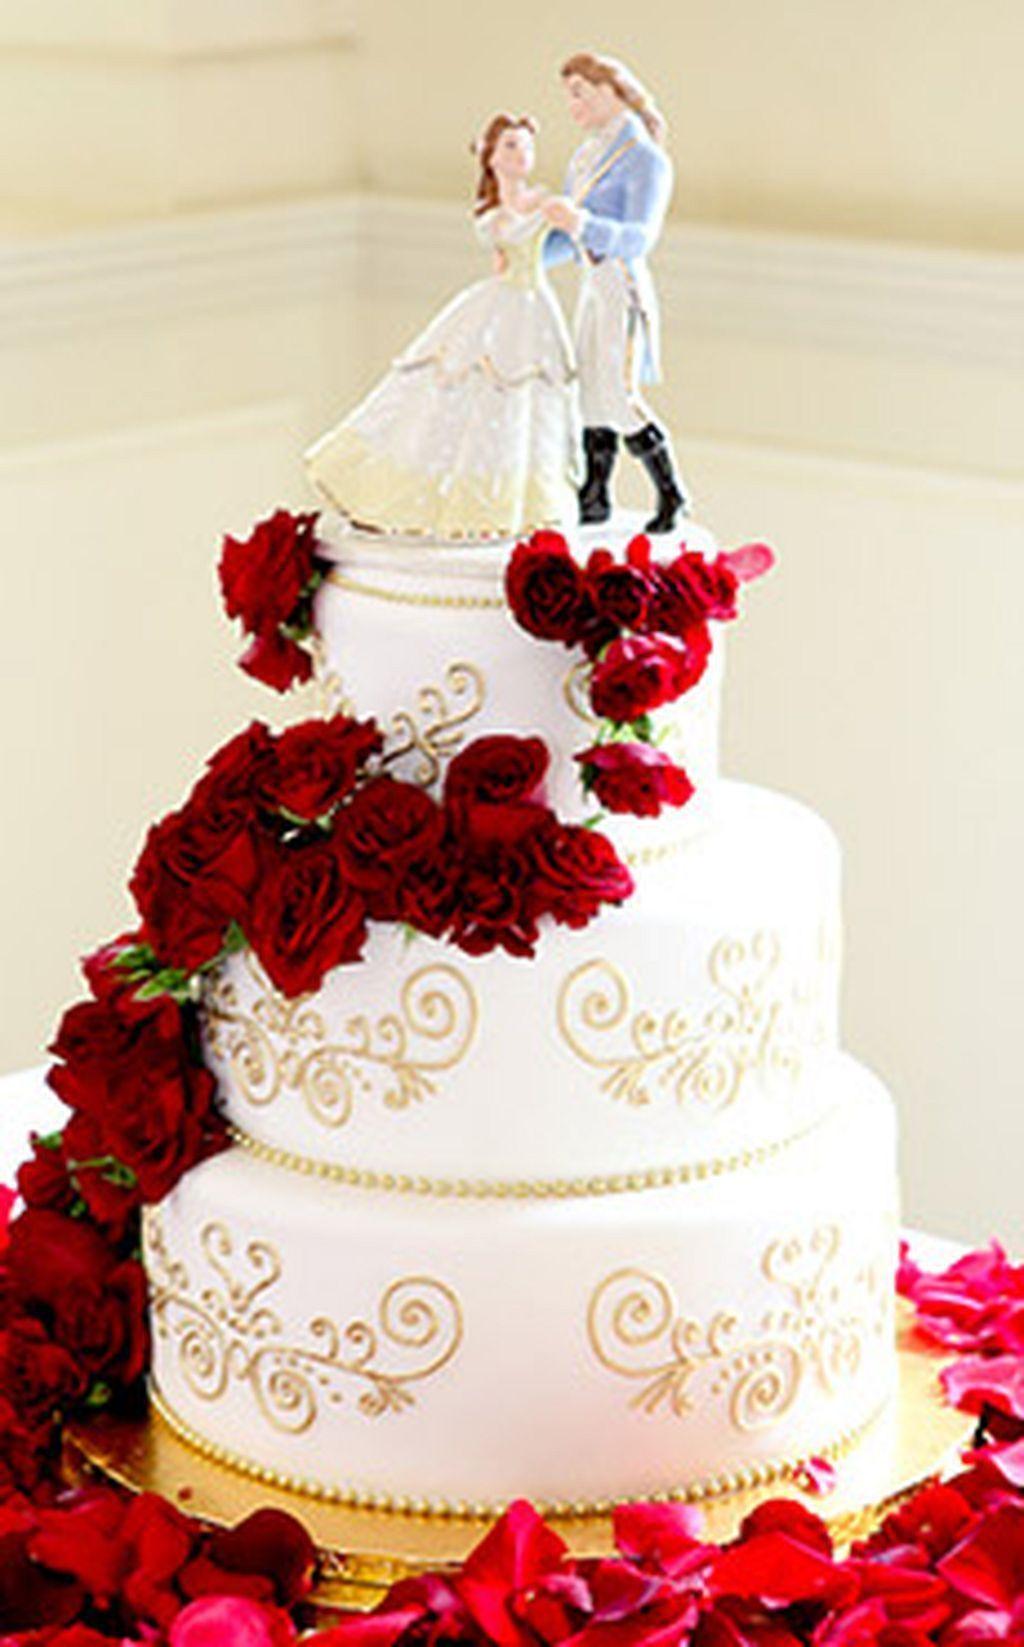 80 beauty and the beast wedding ideas 52 #DisneyWeddingIdeas ...